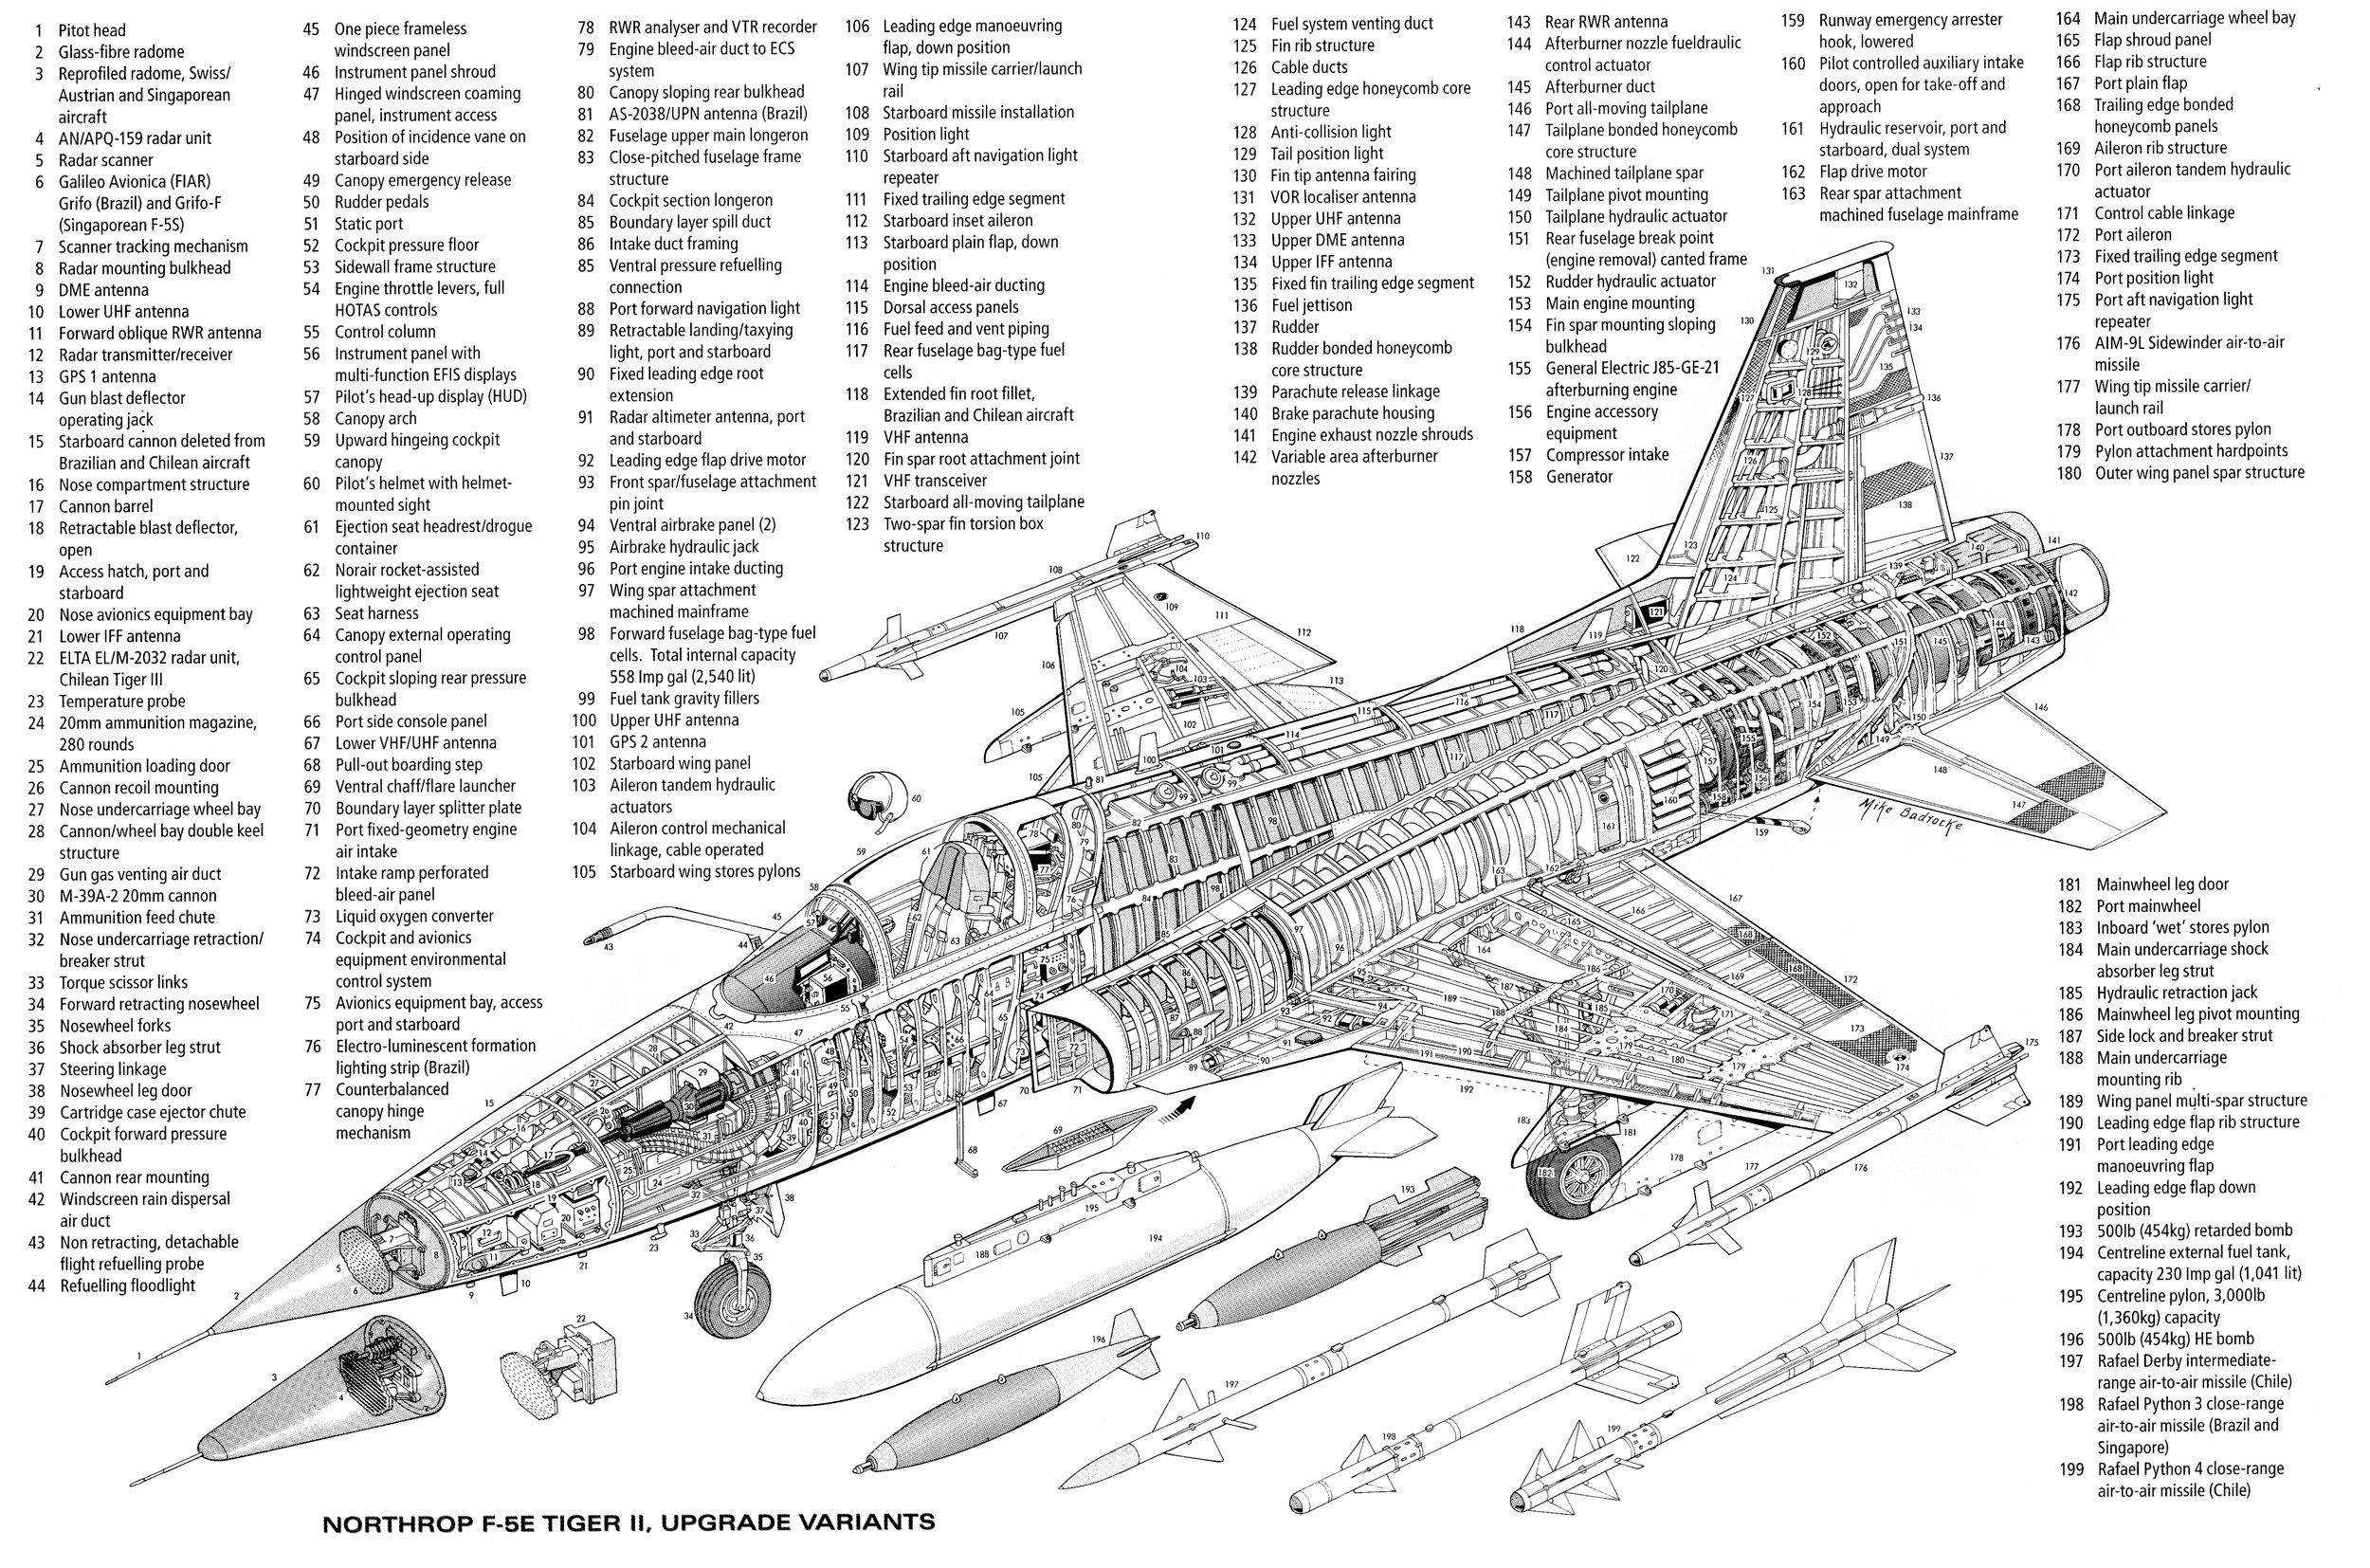 f16 Google Search Aircrafts cutaway details Pinterest